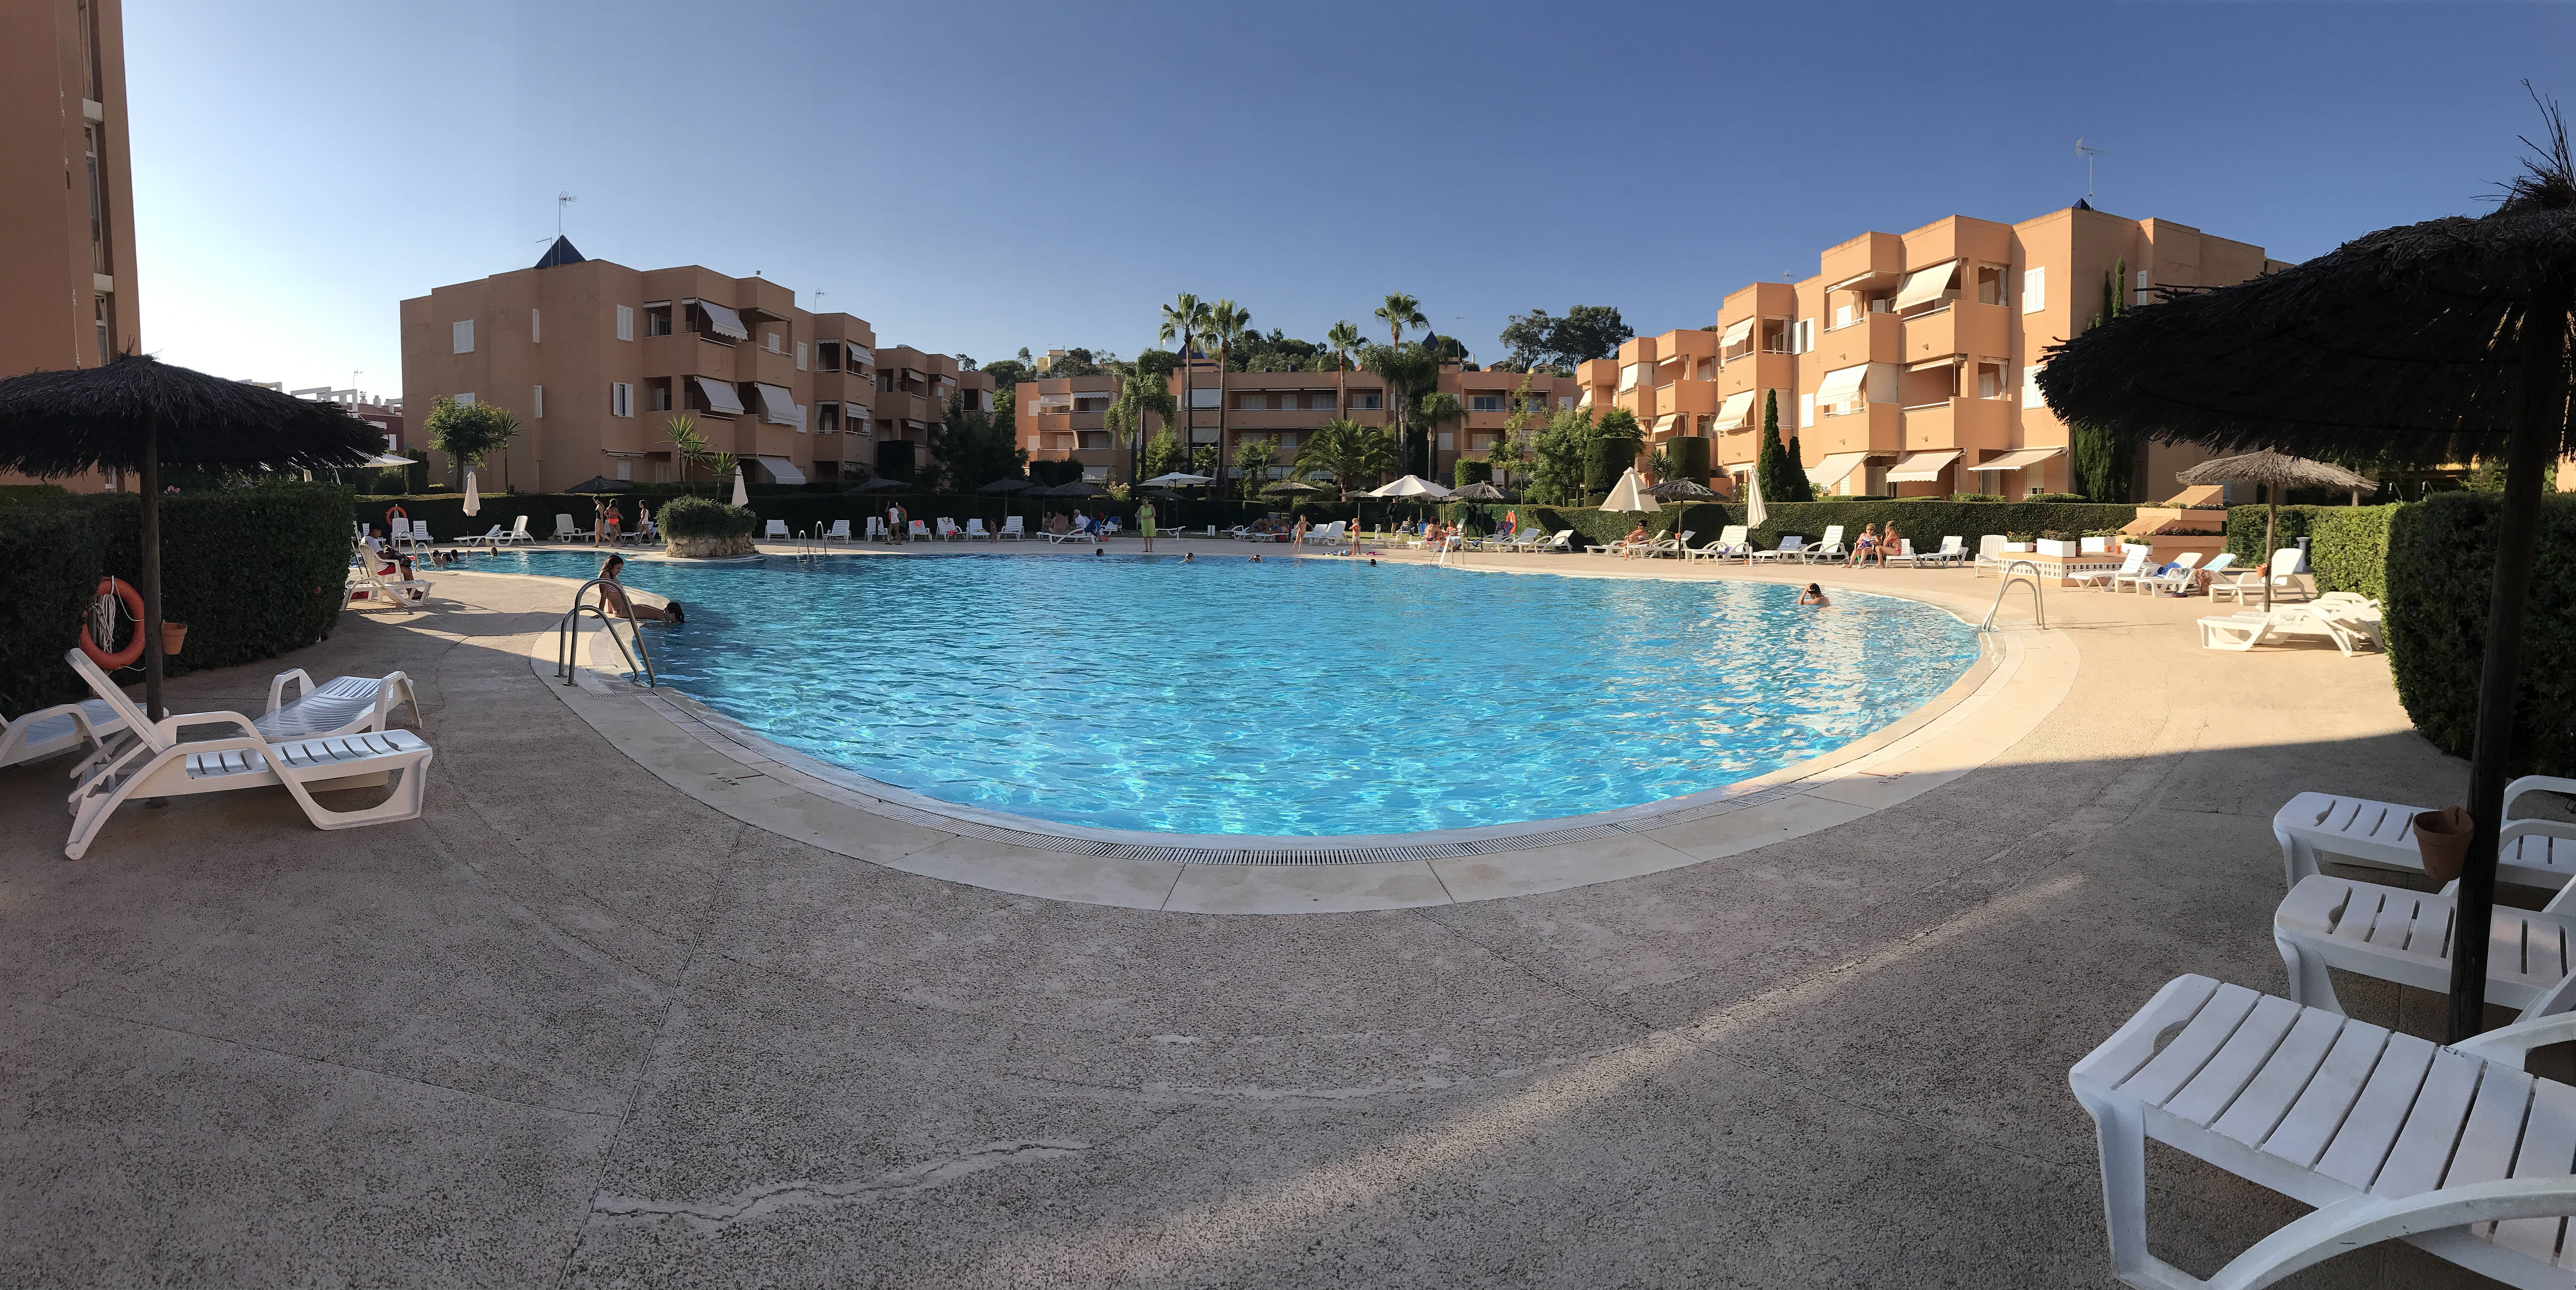 Apartamento para alugar a 150 m da praia islantilla i - Rentalia islantilla ...